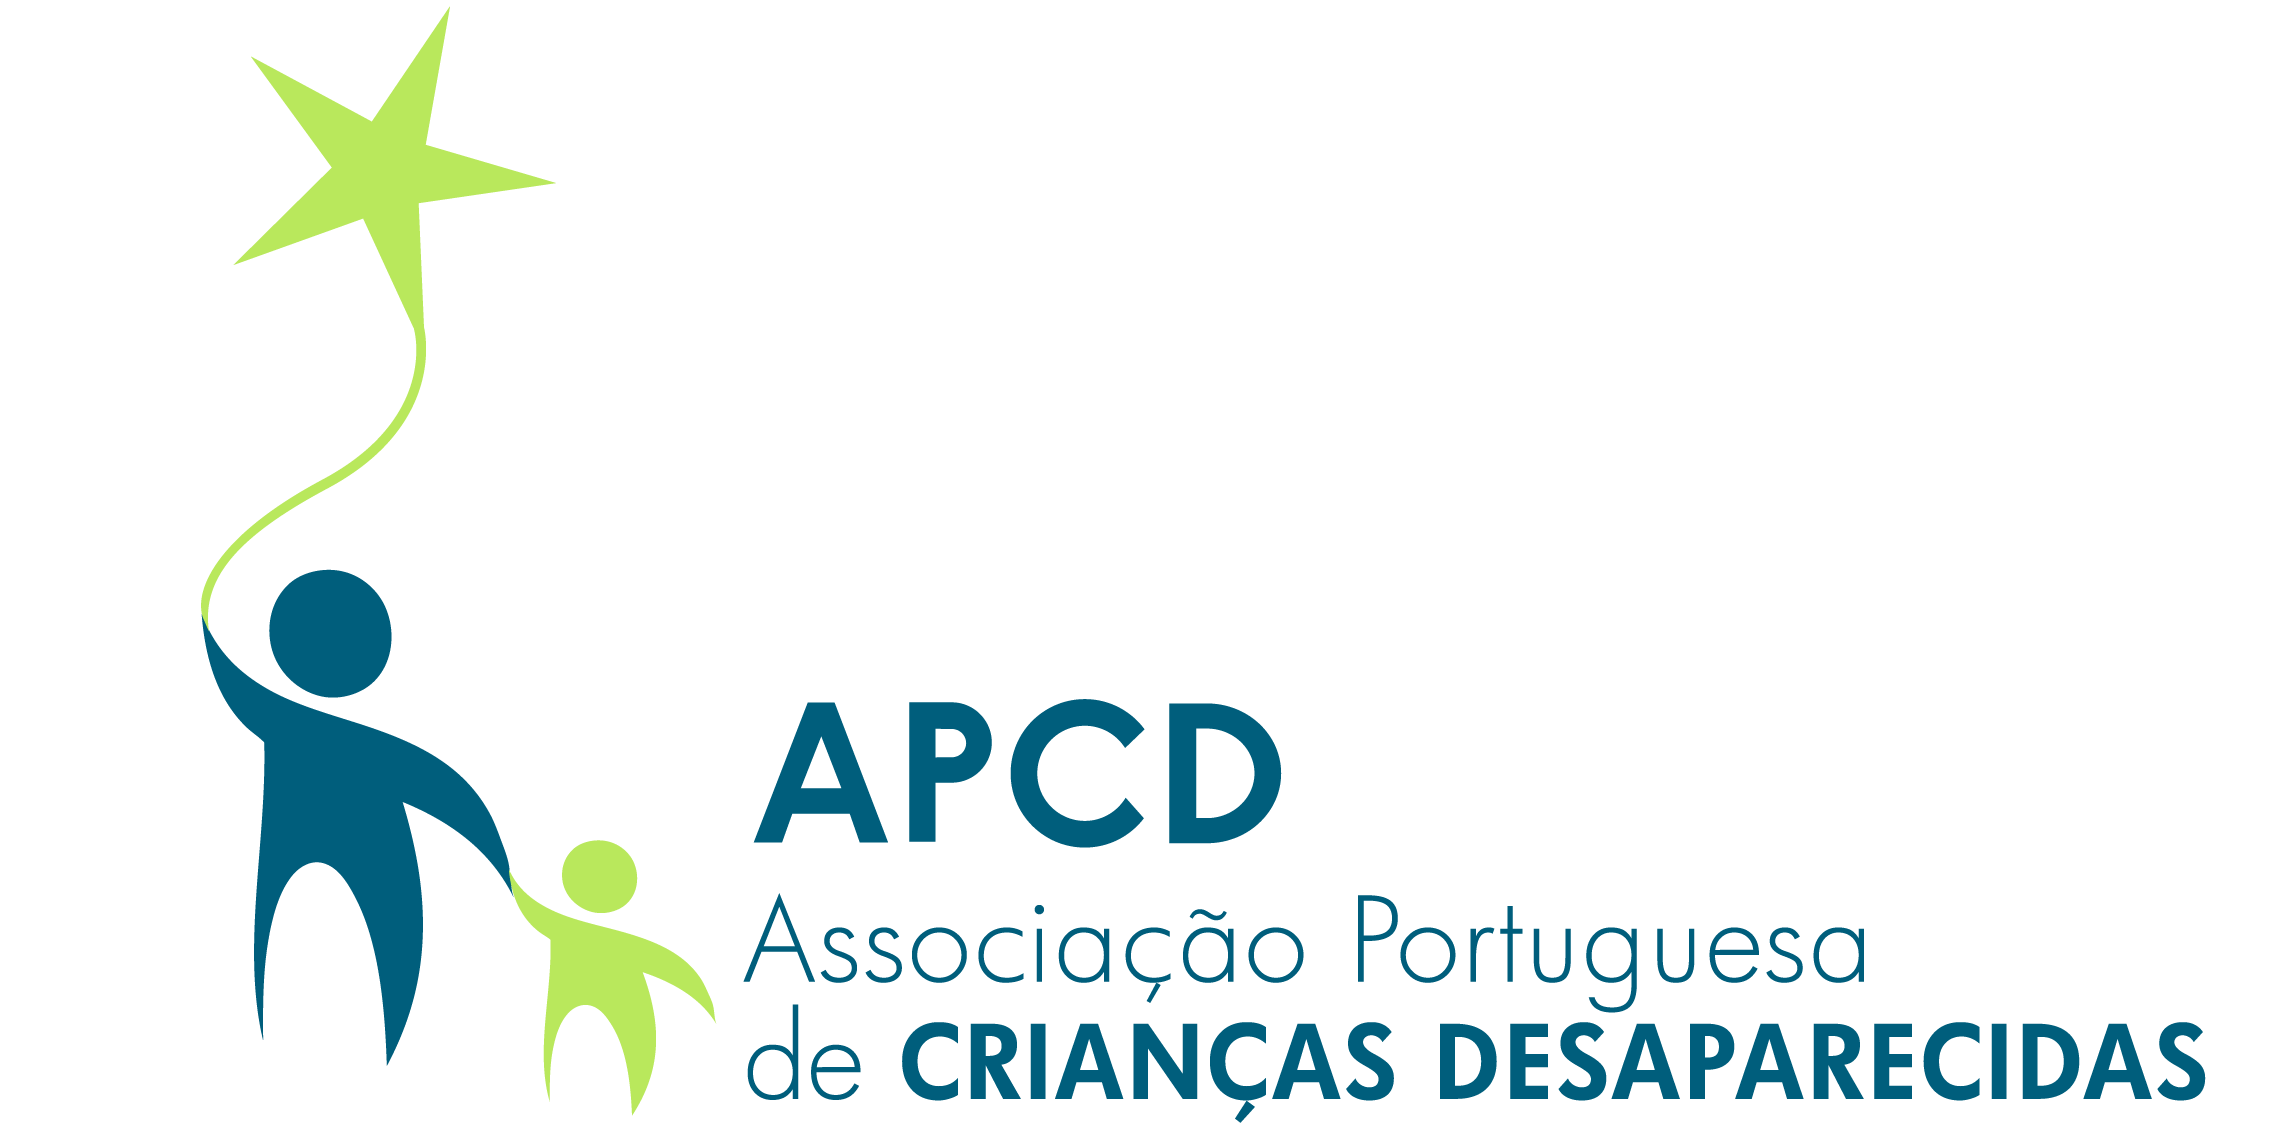 cropped-APCD_logo